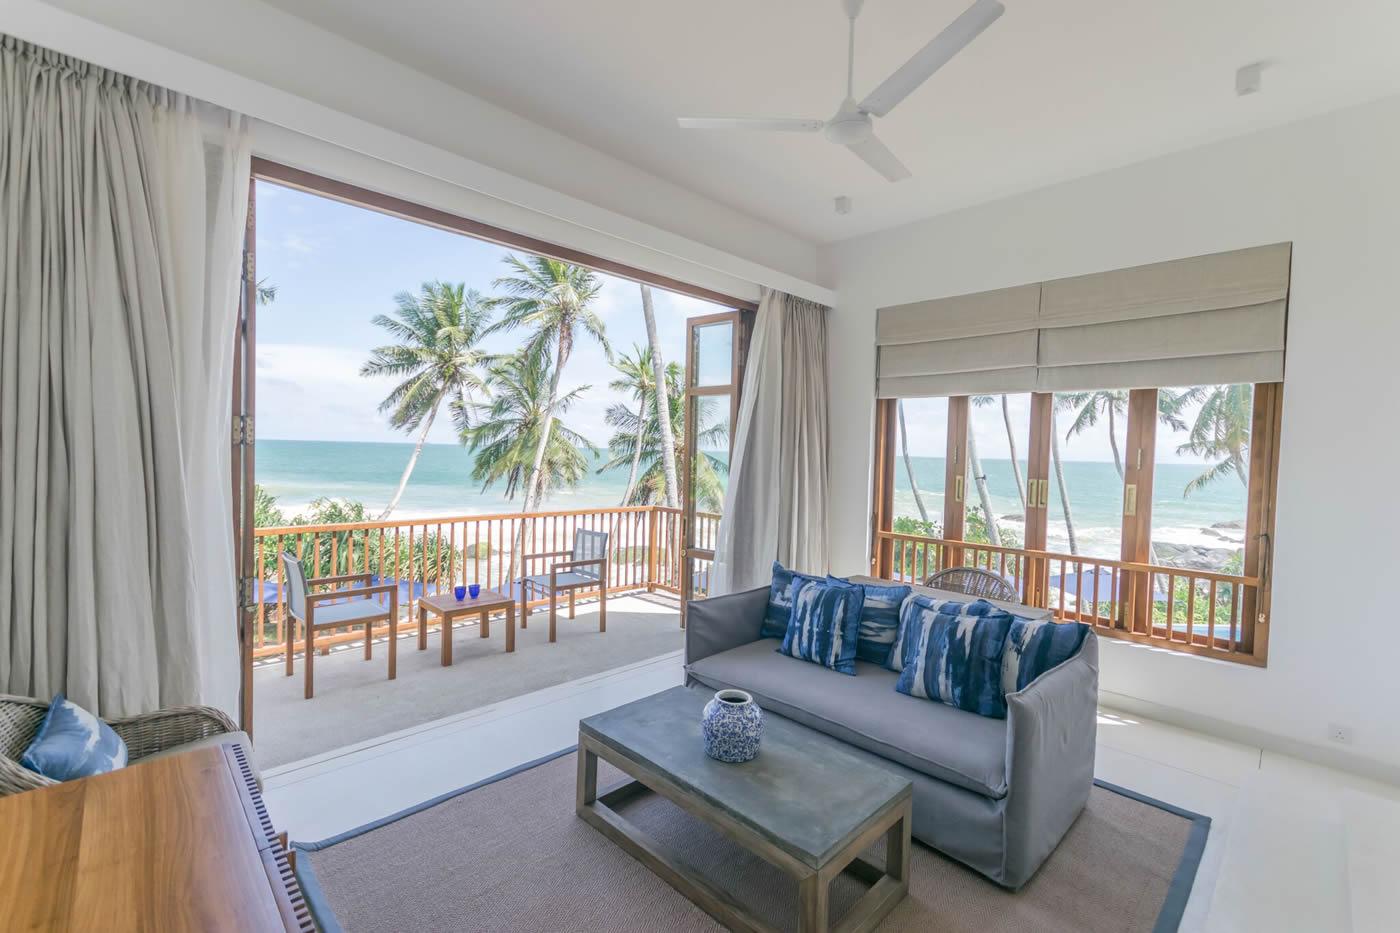 beach boutique hotel balapitiya sri lanka. Black Bedroom Furniture Sets. Home Design Ideas